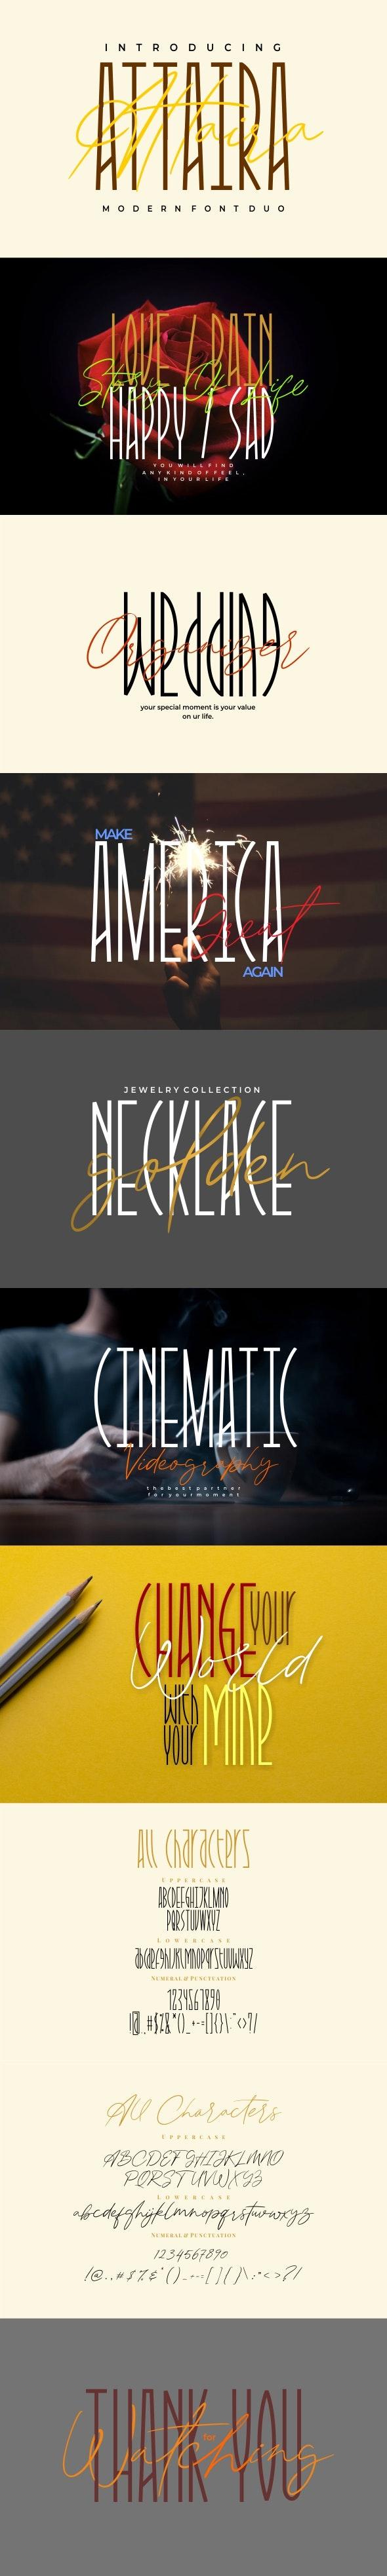 Attaira - Display And Signature Font - Condensed Sans-Serif